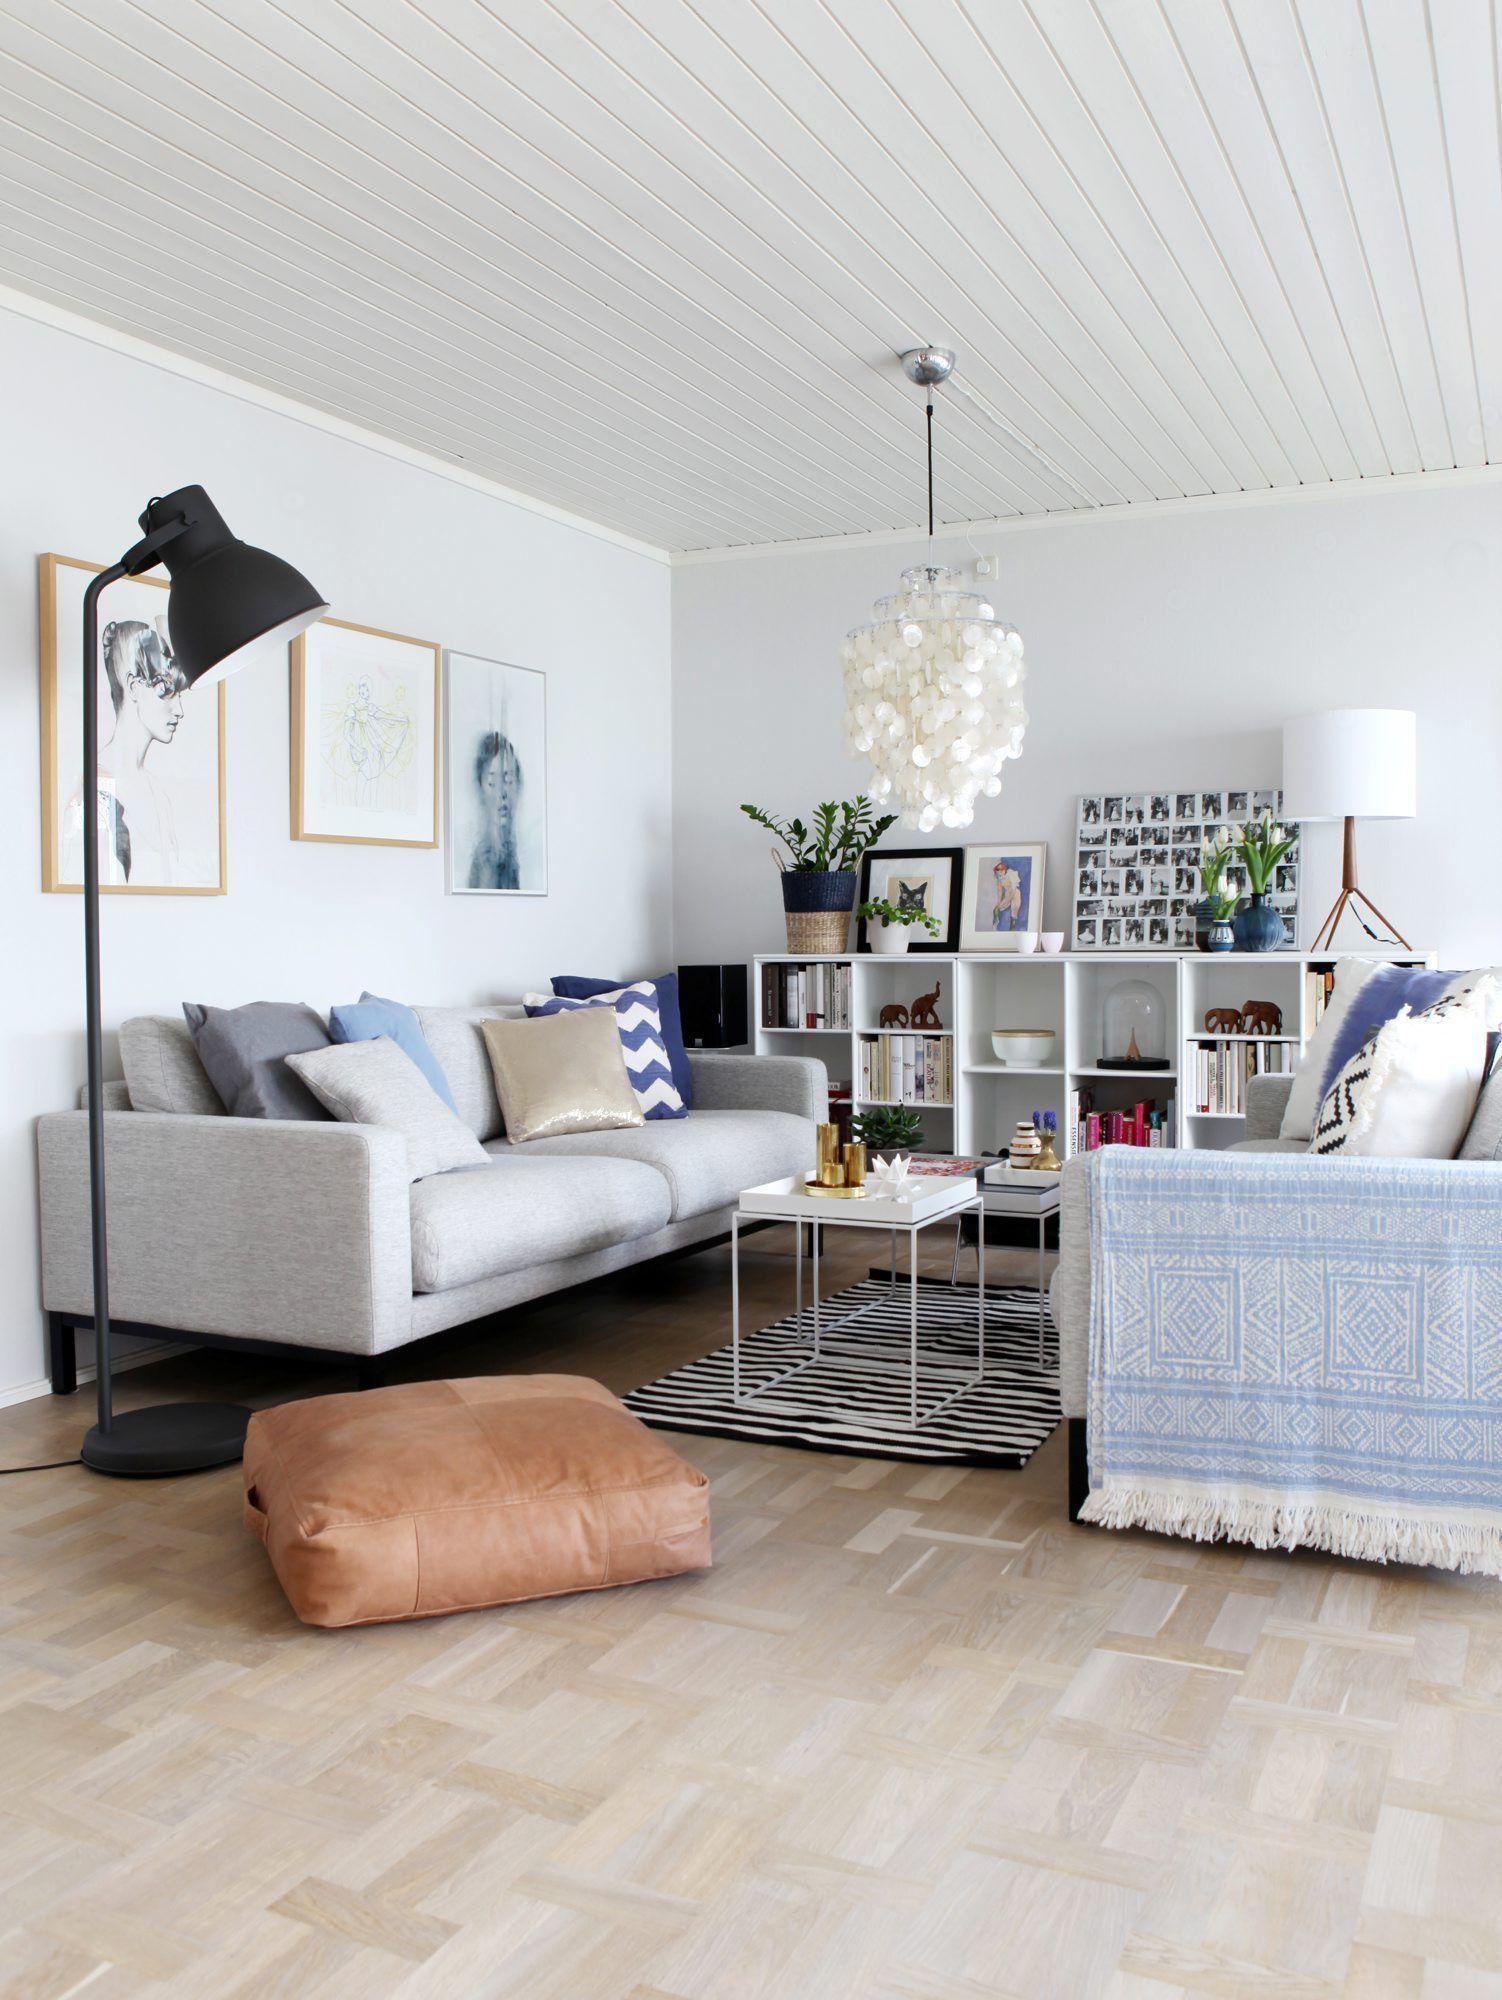 Stue Med Blatoner Contemporary Lighting Living Room Floor Lamp Design Ikea Living Room